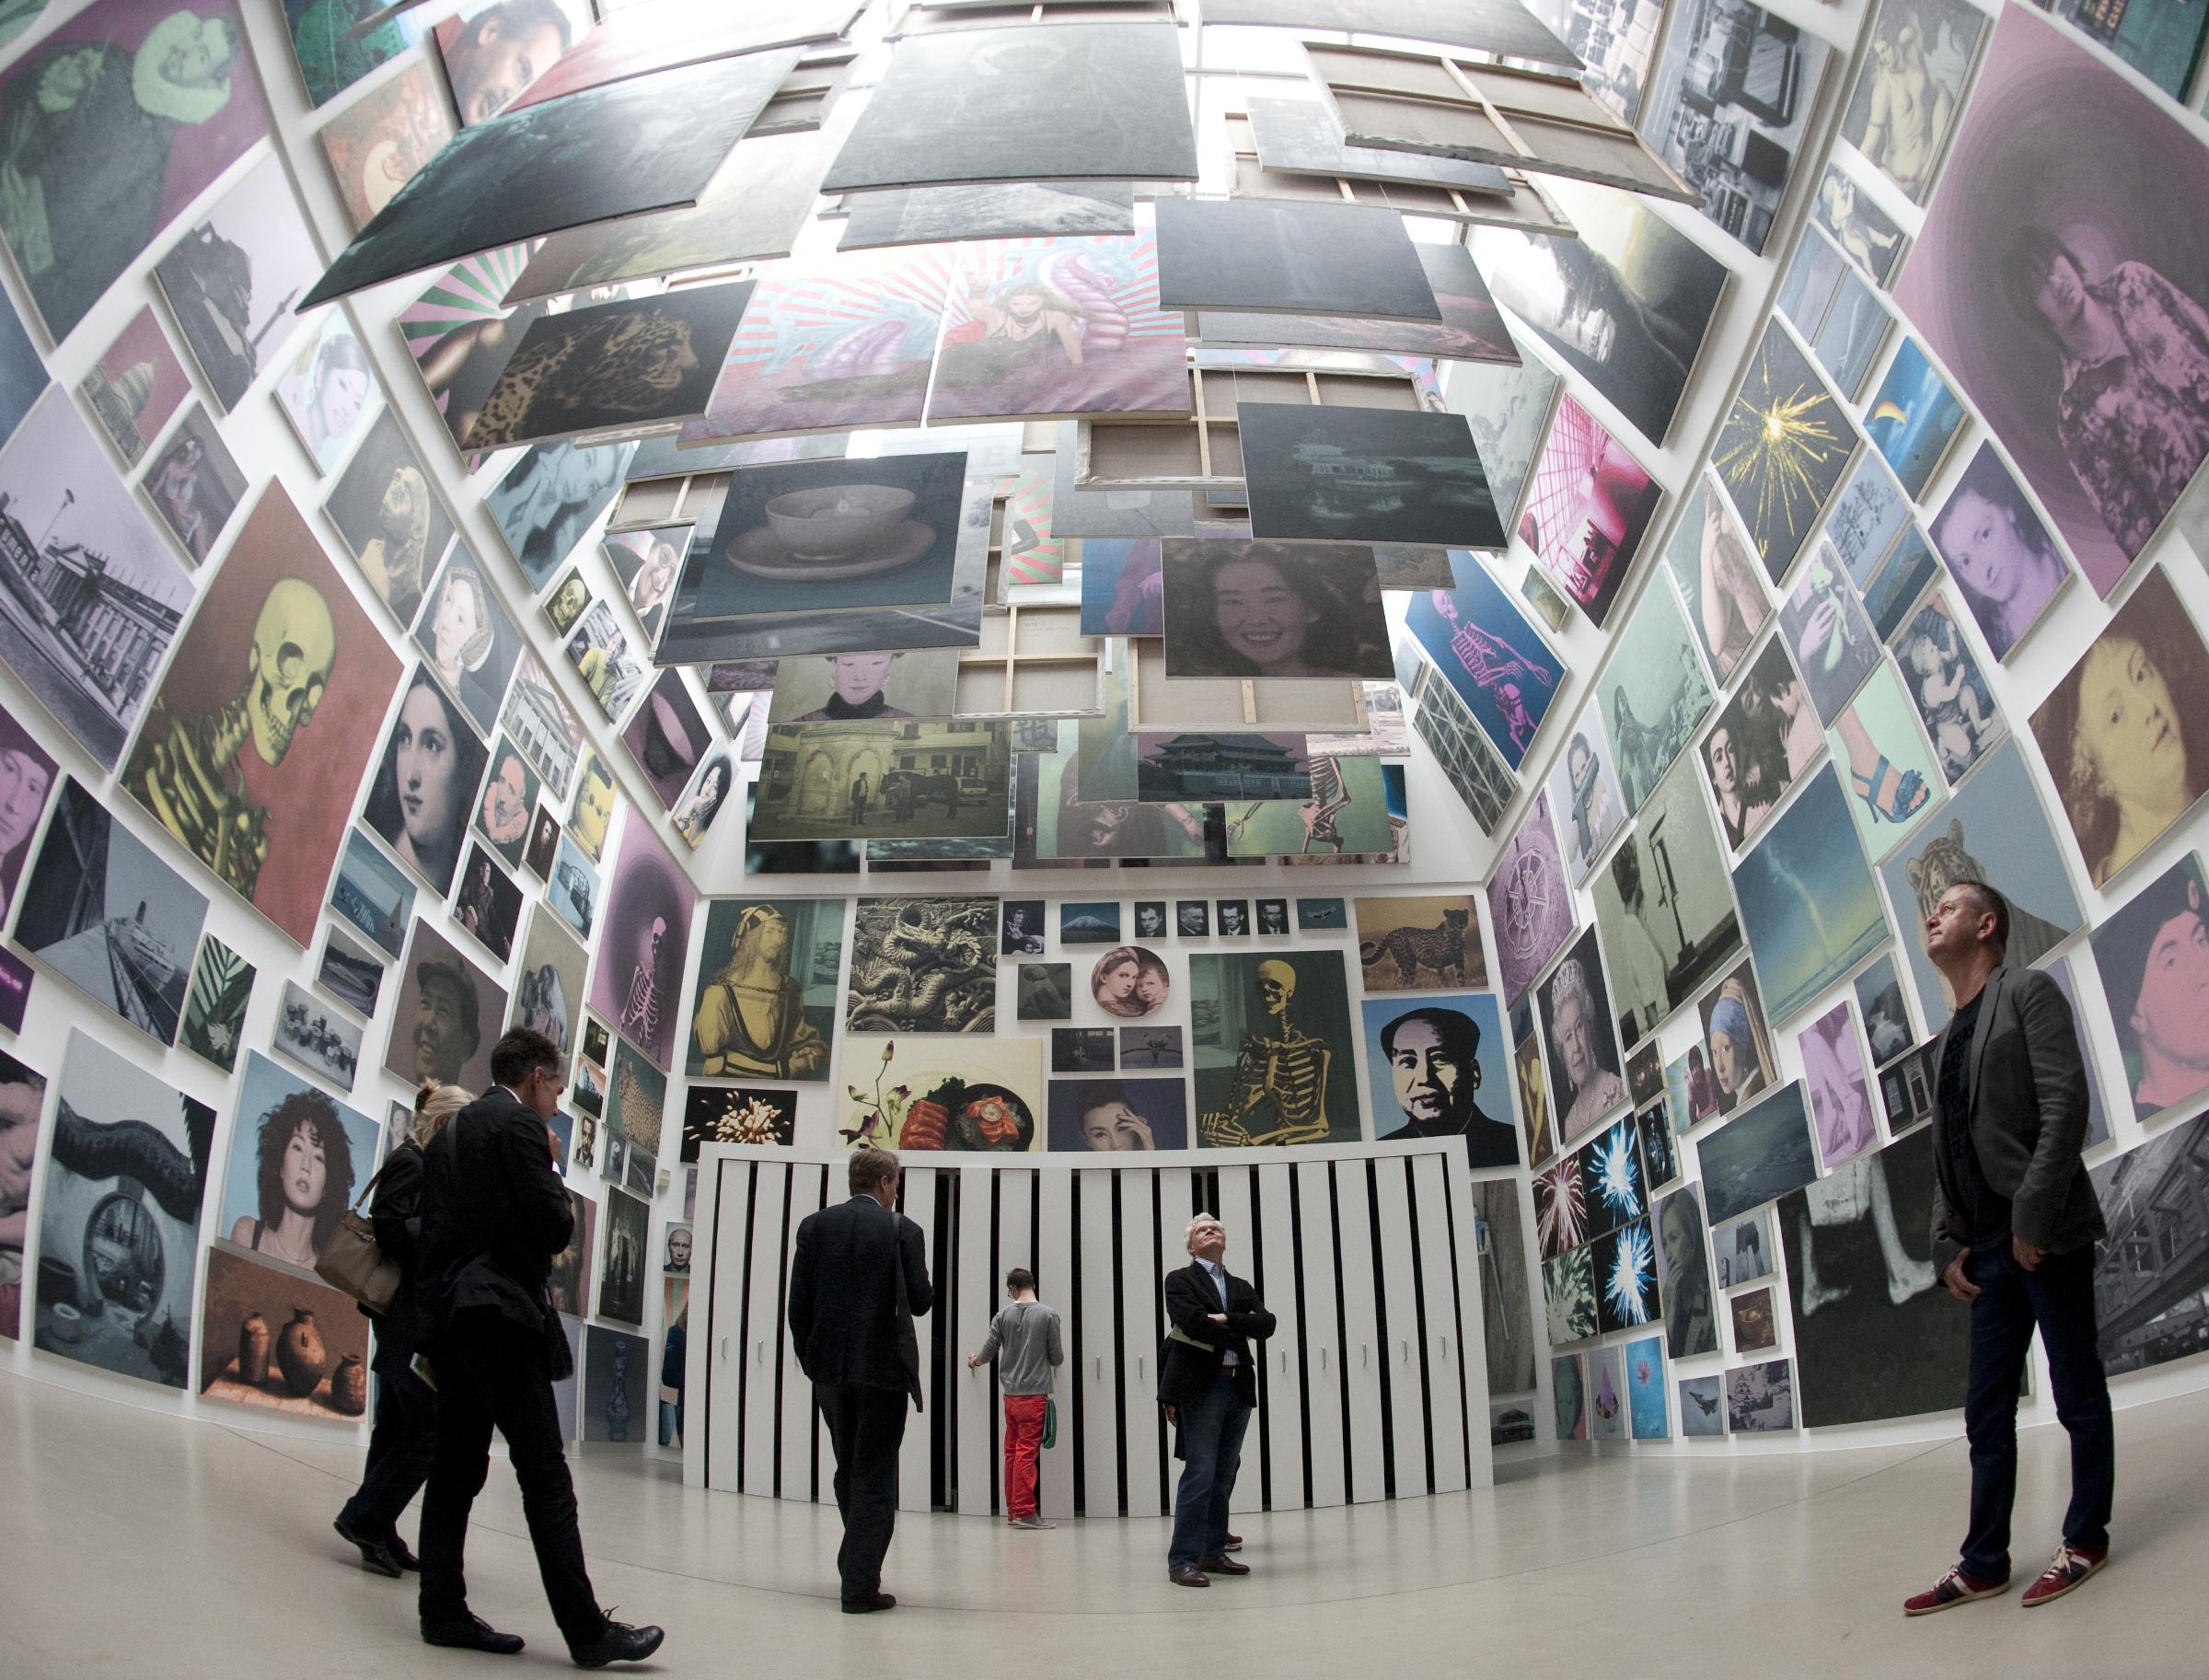 Stadtgespr ch kassel diskutiert ber die documenta for Documenta kassel 2017